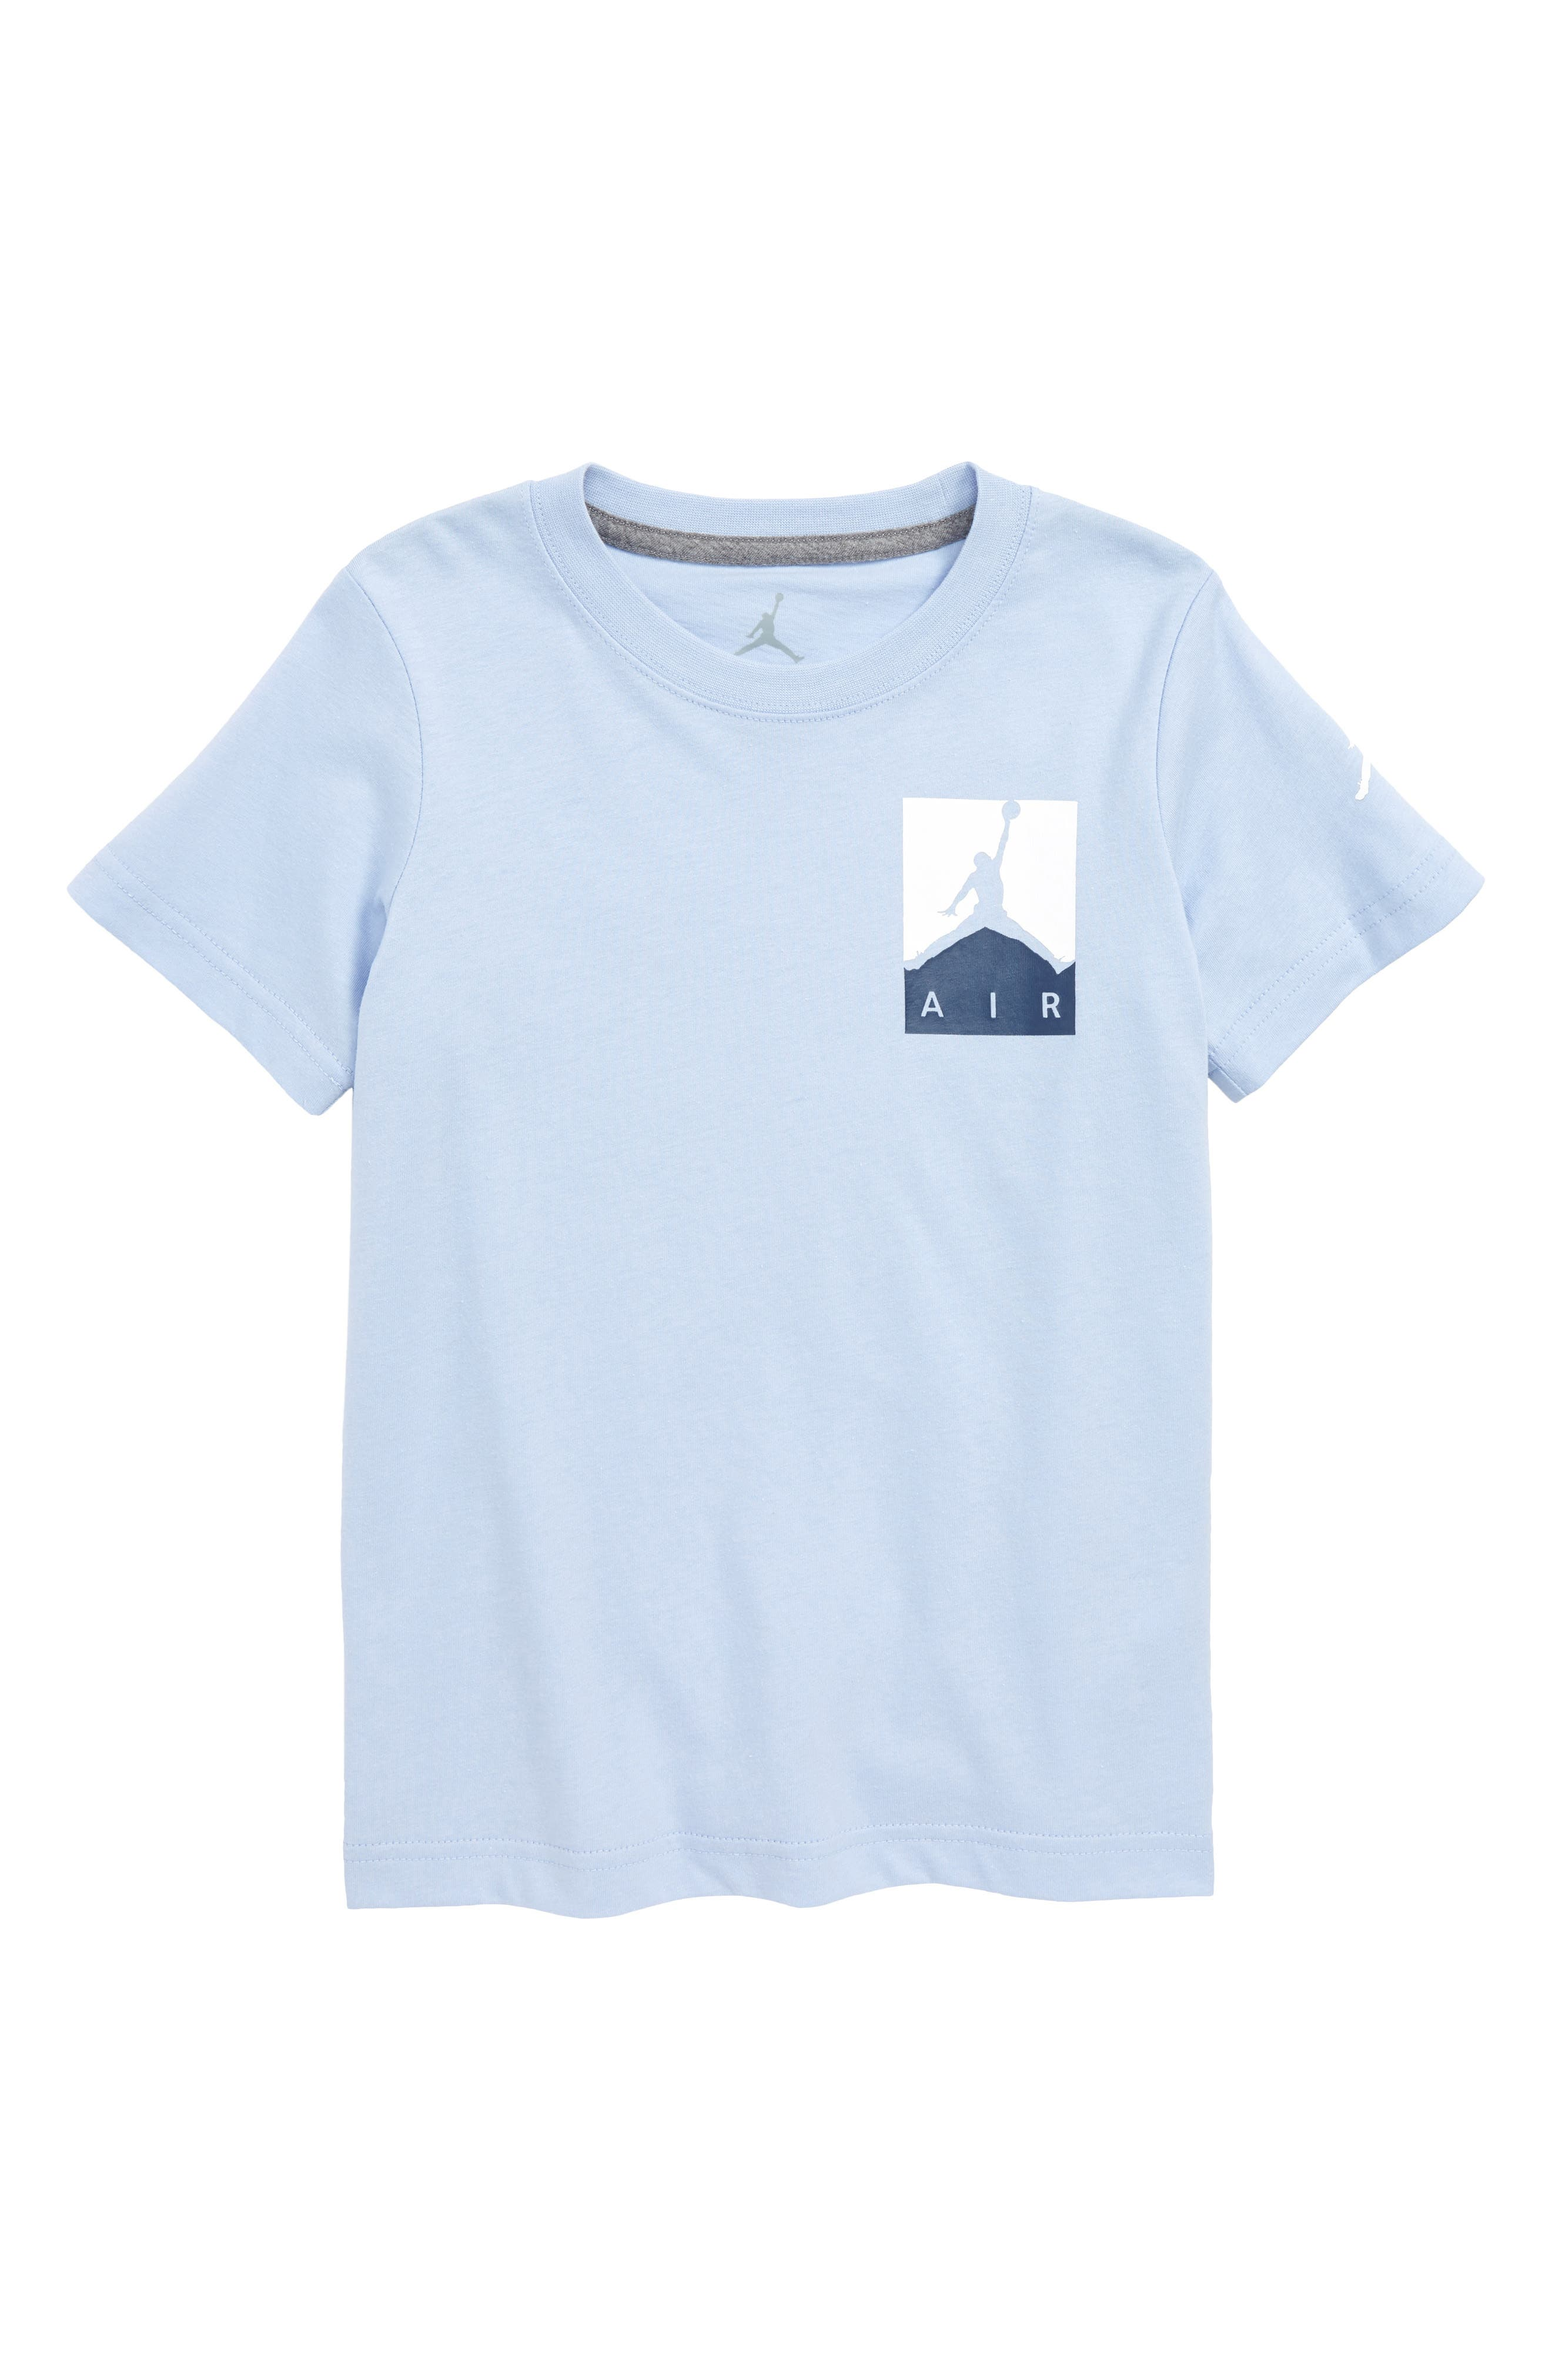 Nike Jordan Racked Up Graphic T-Shirt,                             Main thumbnail 1, color,                             Cobalt Bliss